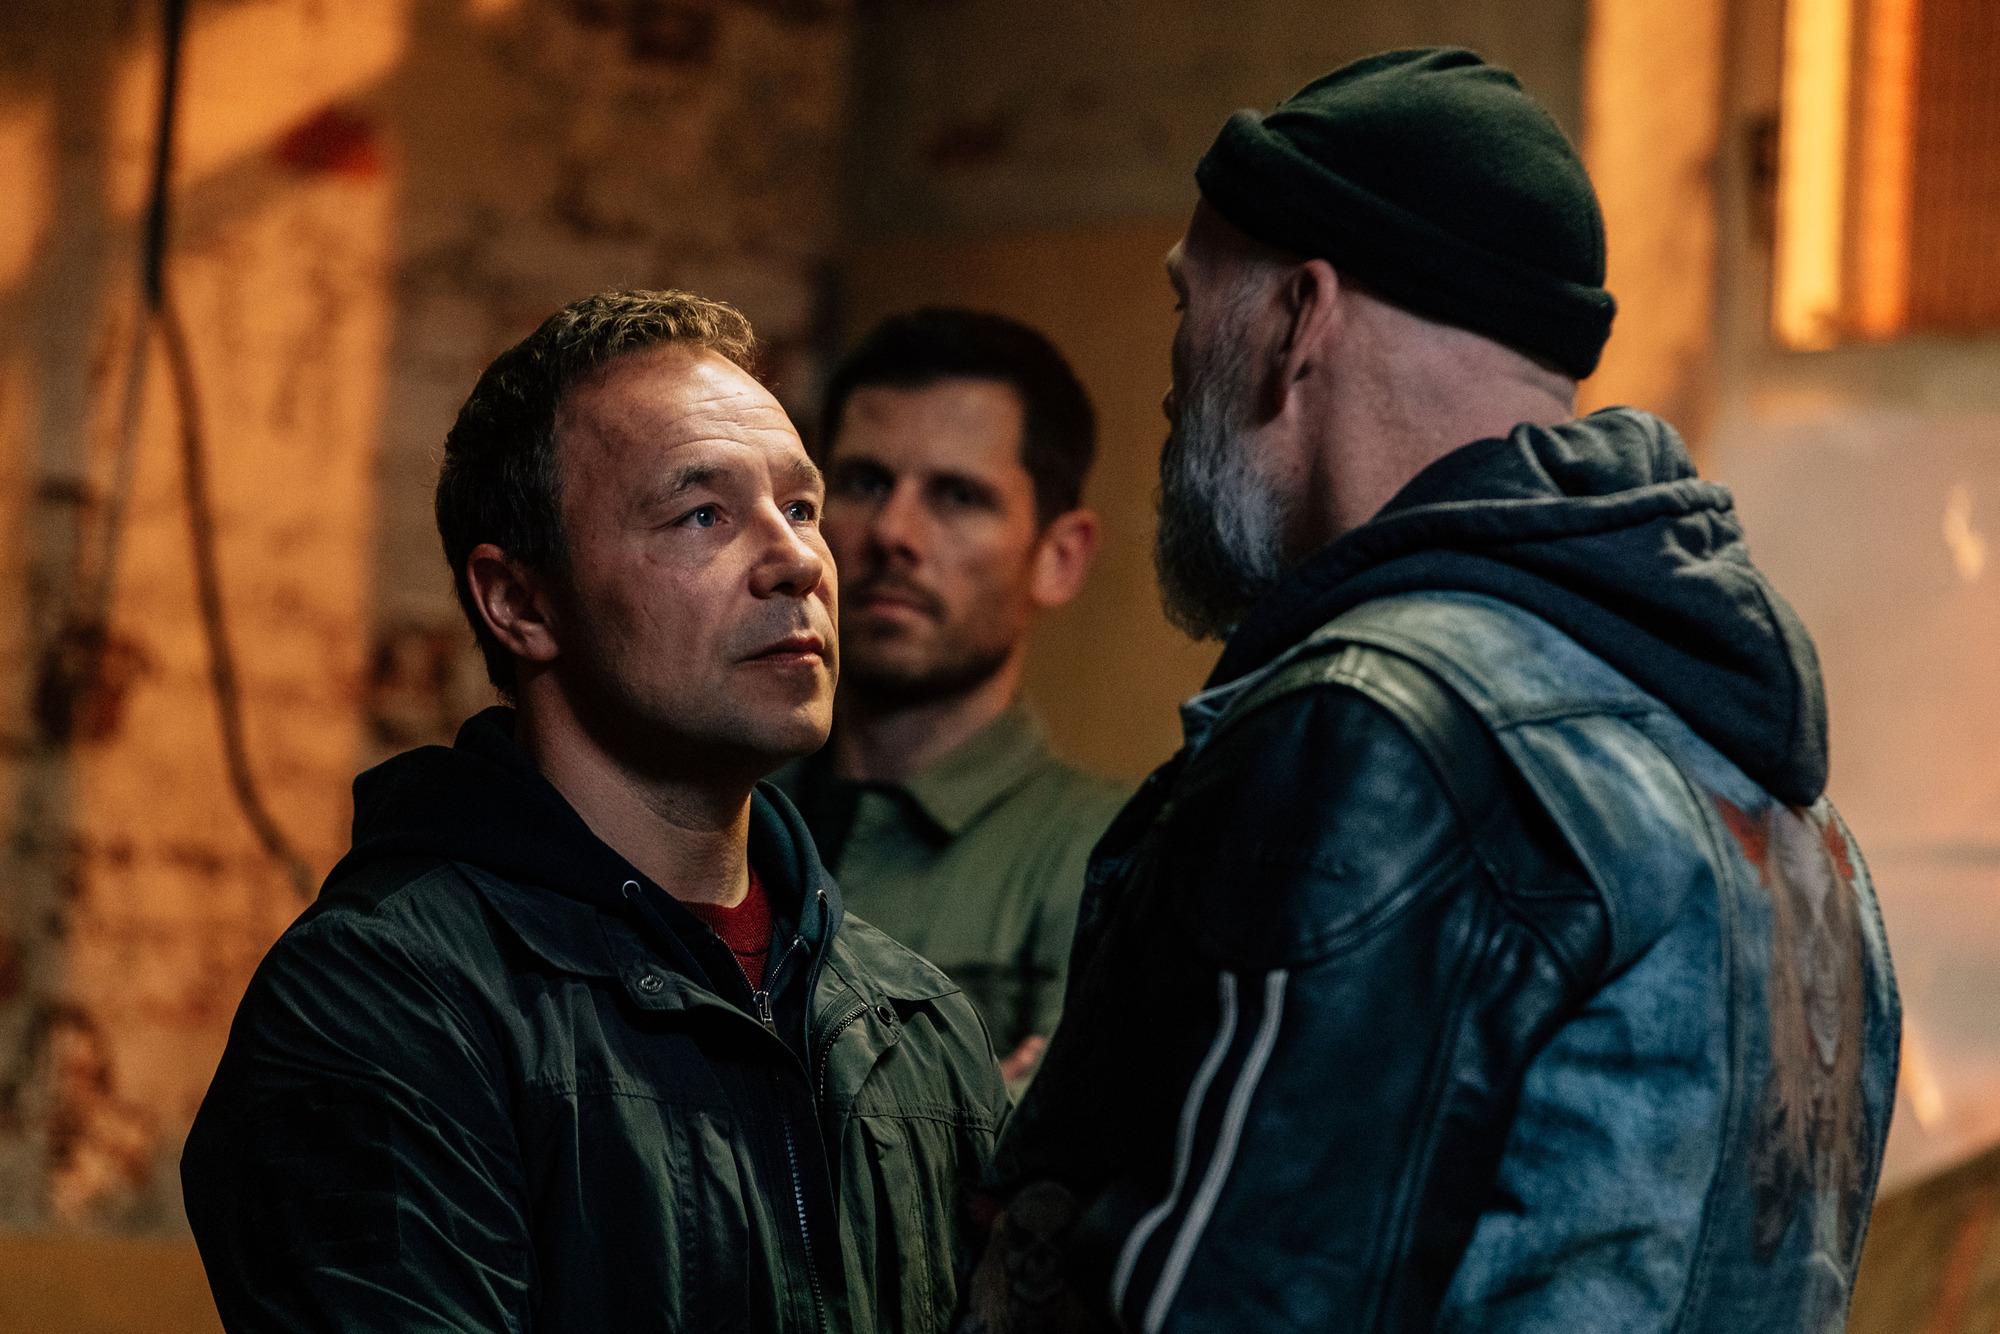 Balaclava Man Corbett (Stephen Graham) talks to Lee (Alastair Natkiel) and Slater (Barry Aird) on Line Of Duty